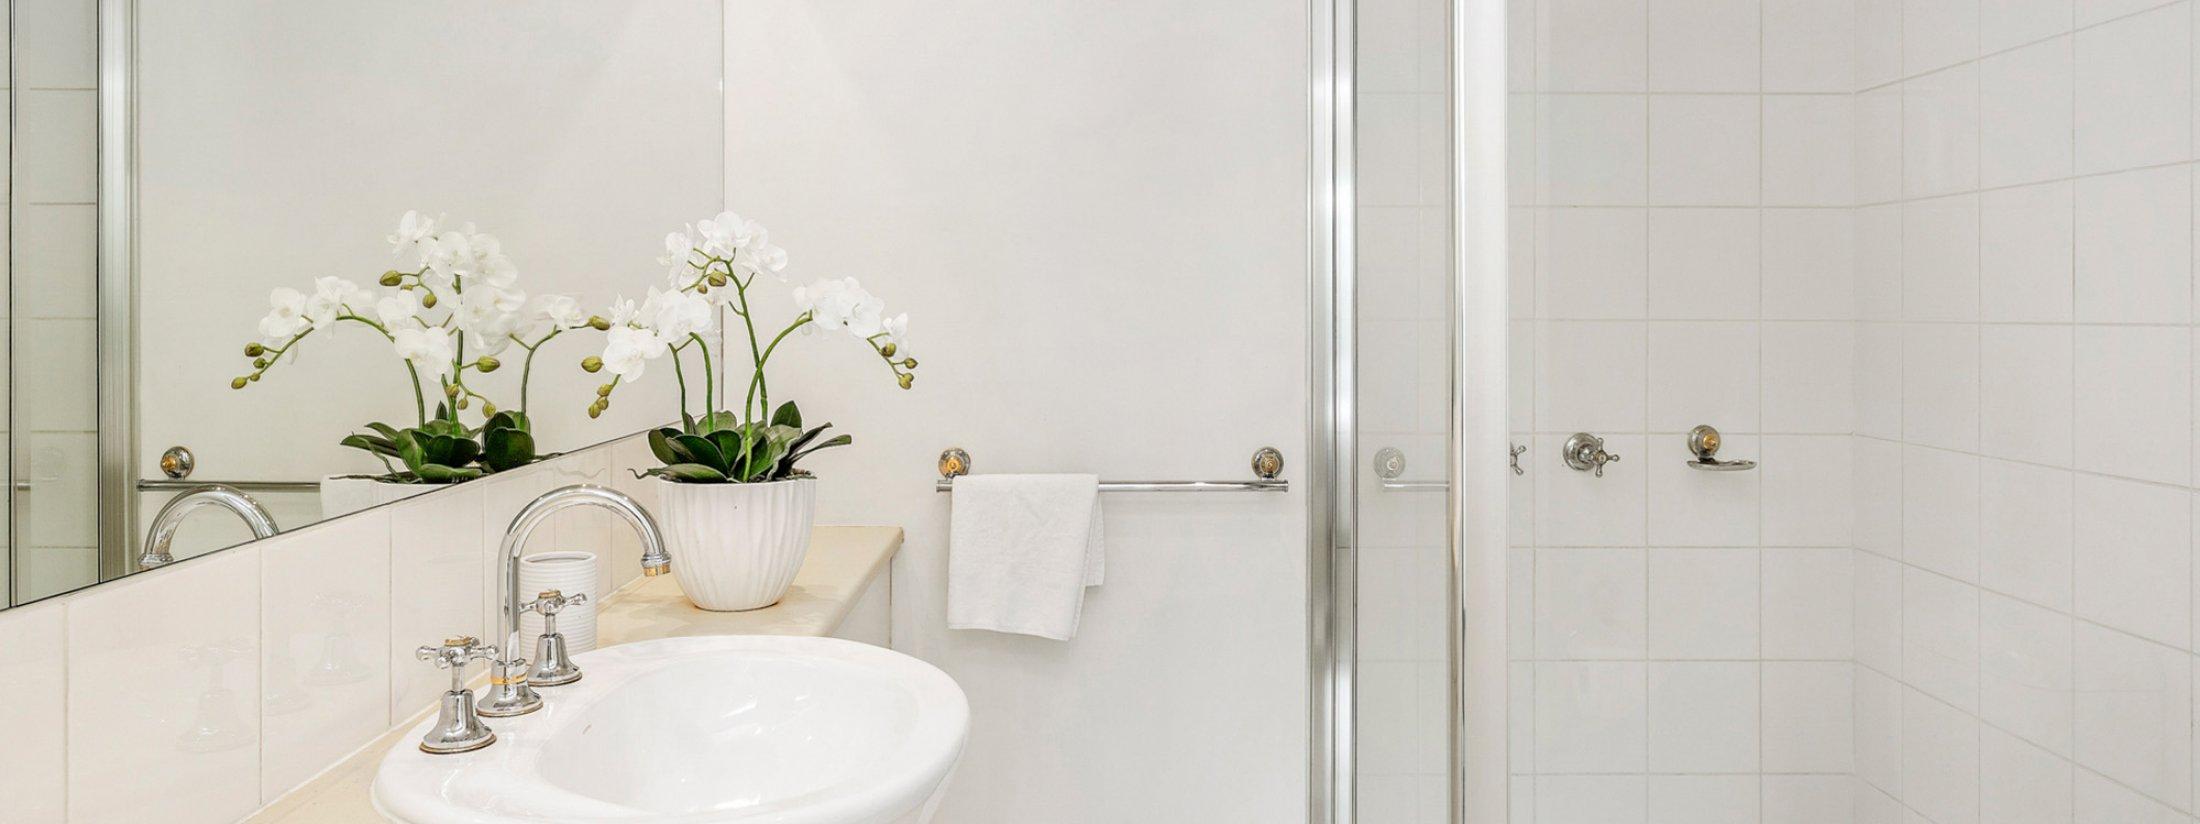 Alberts on Esplanade - Port Melbourne - Ensuite Bathroom